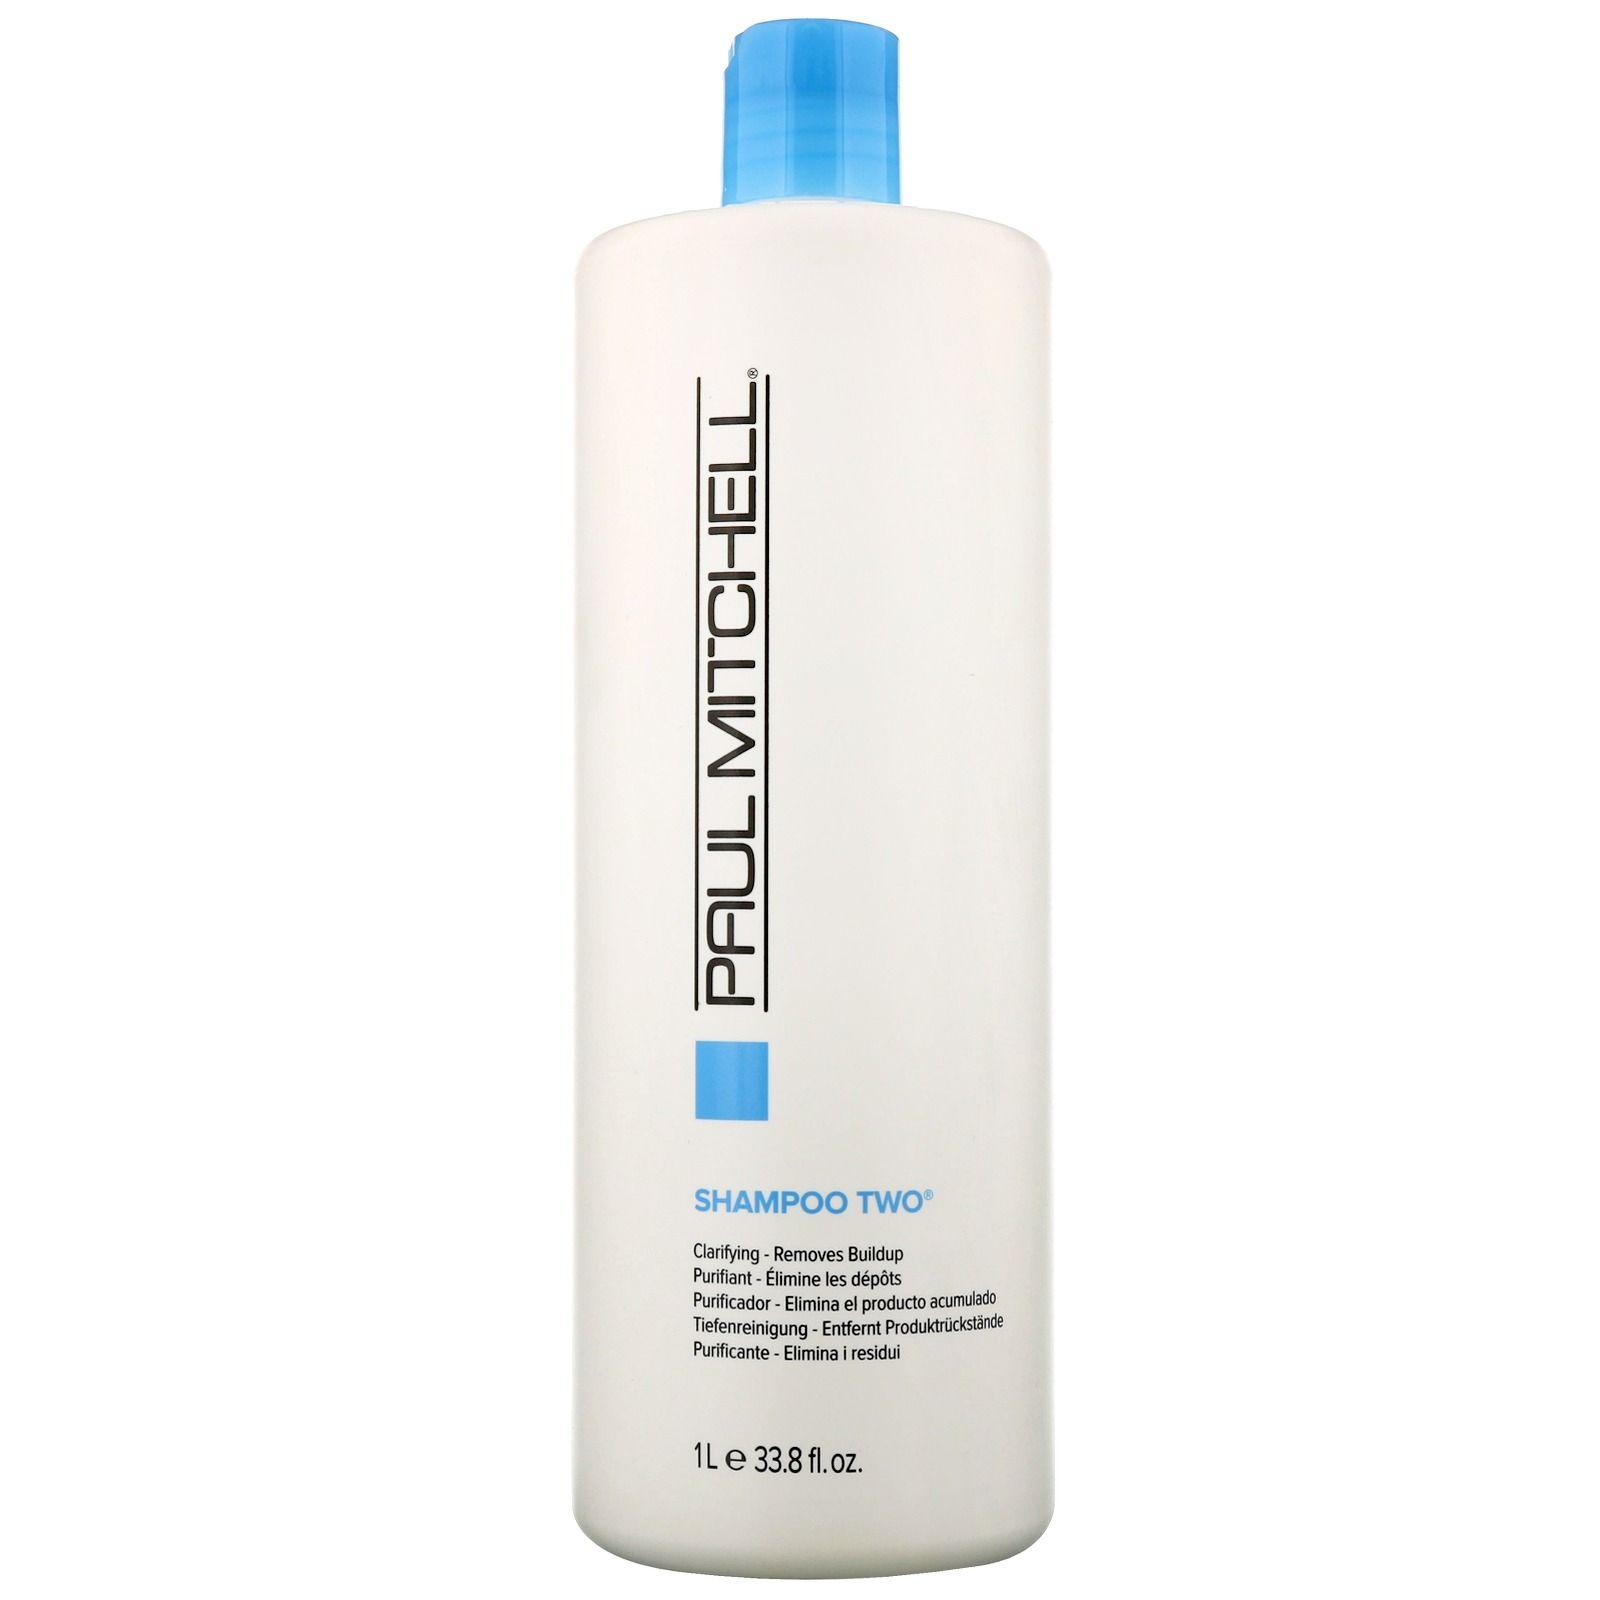 Paul Mitchell Shampoo Two - 1000ml